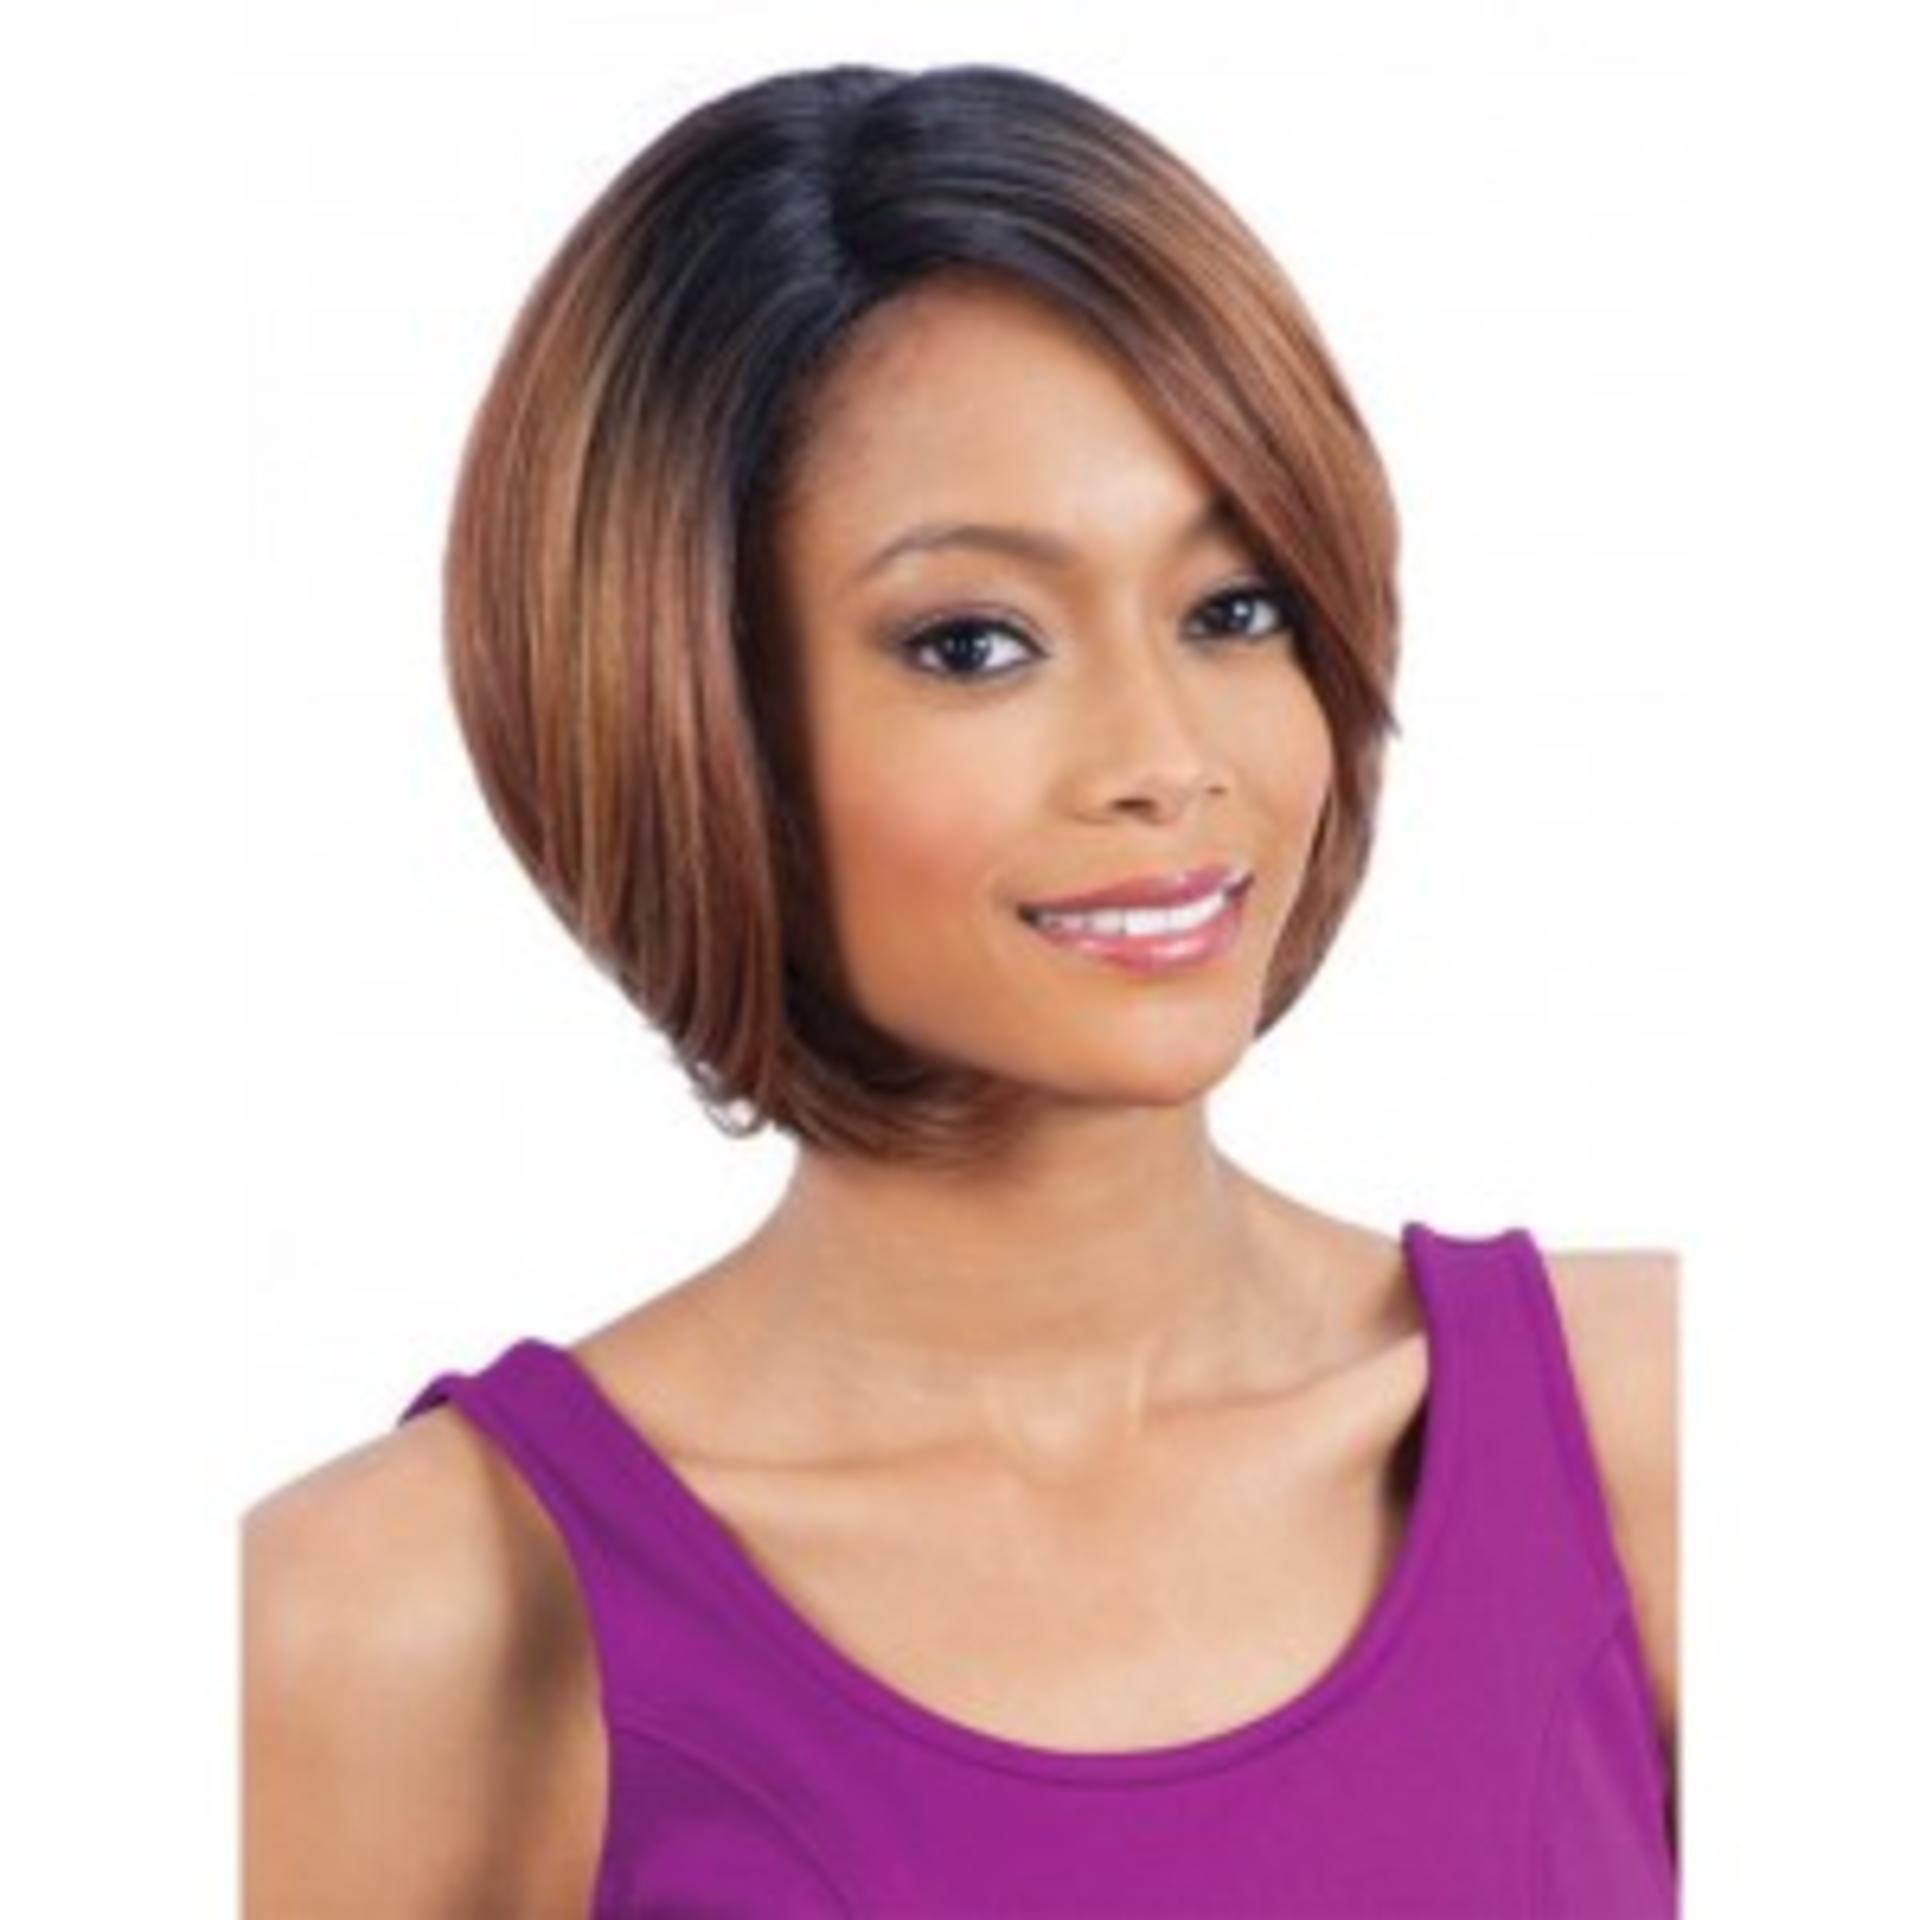 itsmonishamehta - freetress-equal-deep-diagonal-part-lace-front-wig-purple-blossom-979